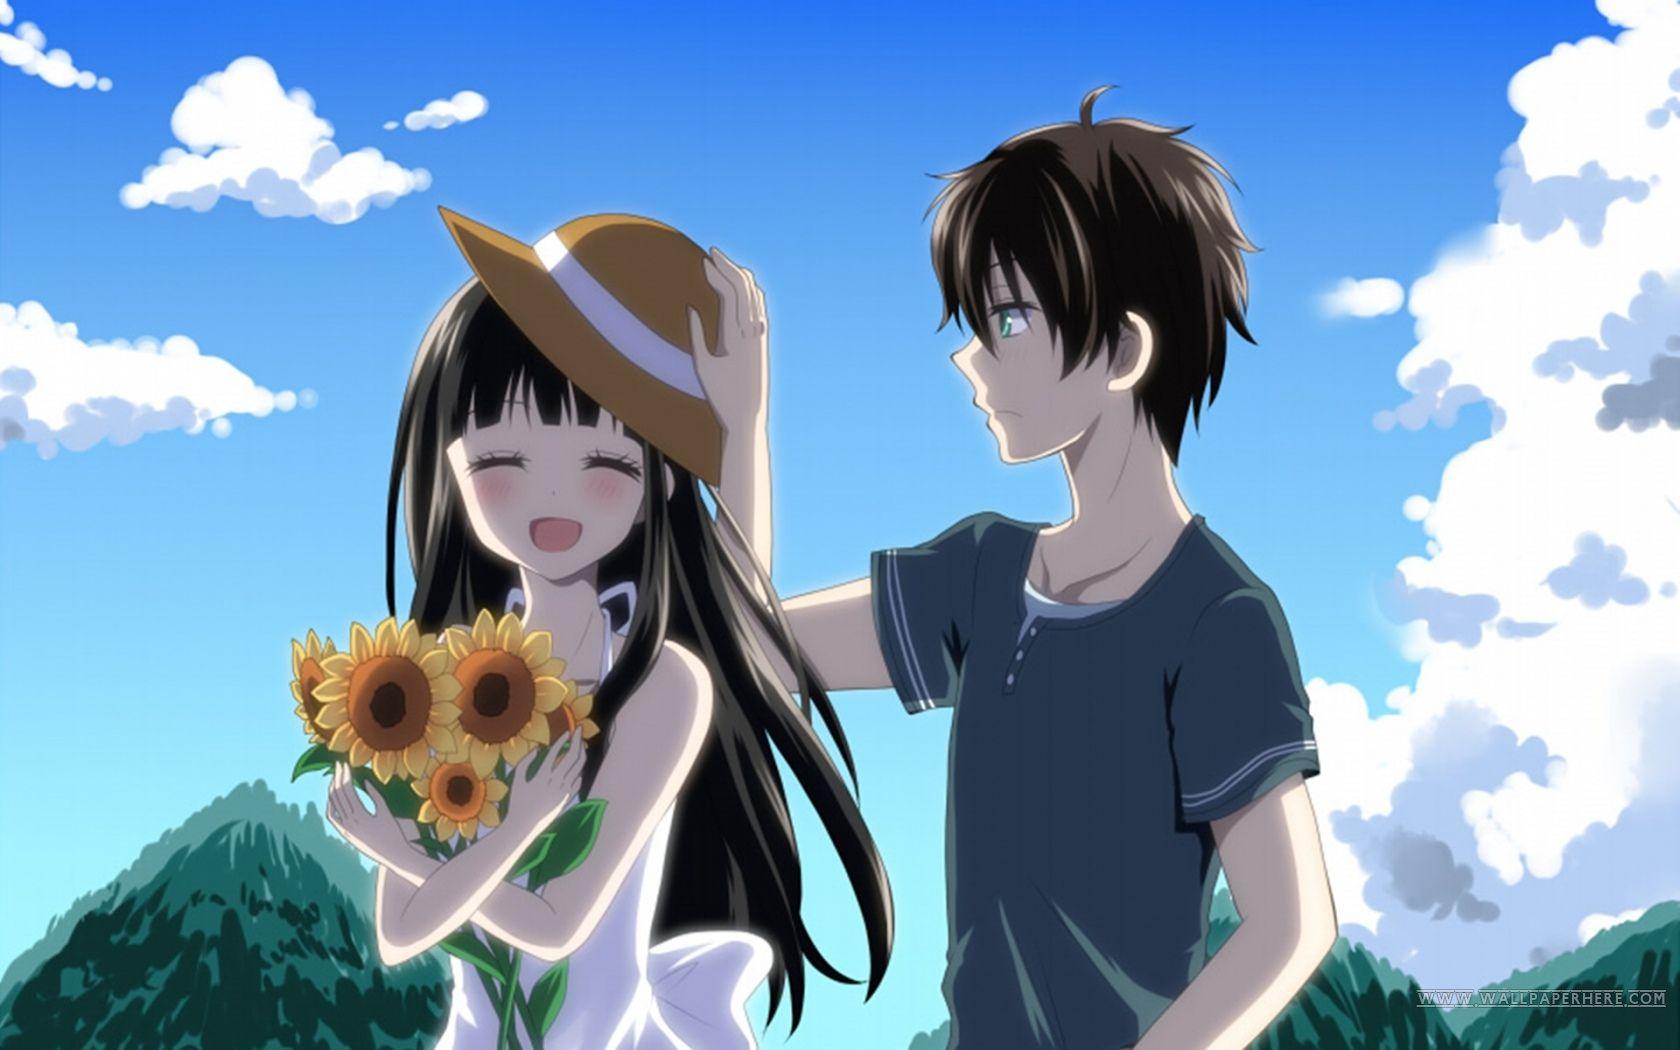 Anime Hyouka Hōtarō Oreki Eru Chitanda Wallpaper Cute Anime Wallpaper Hyouka Romantic Anime